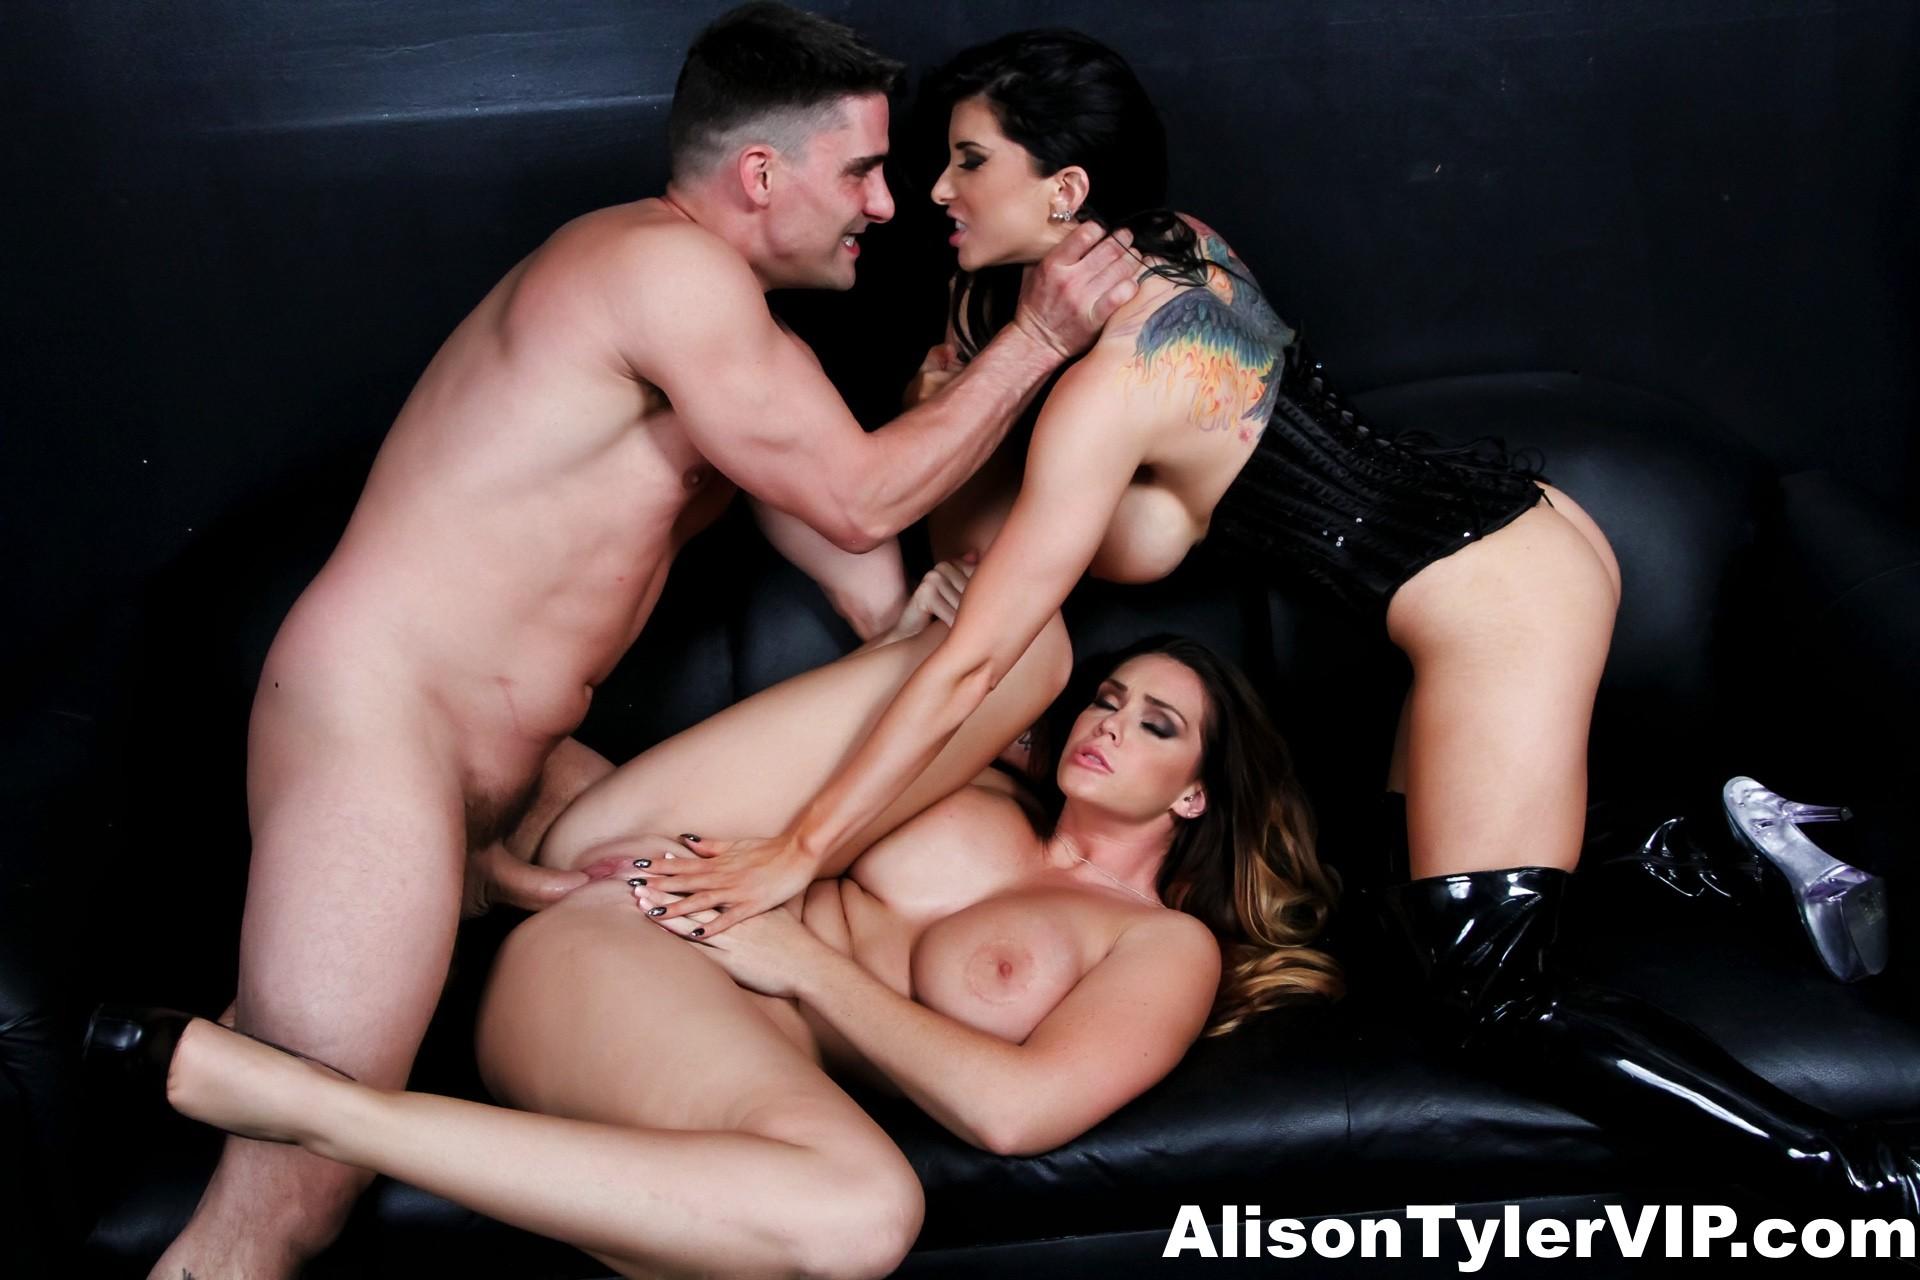 Alison tyler eats romi rain039s wet pussy 3